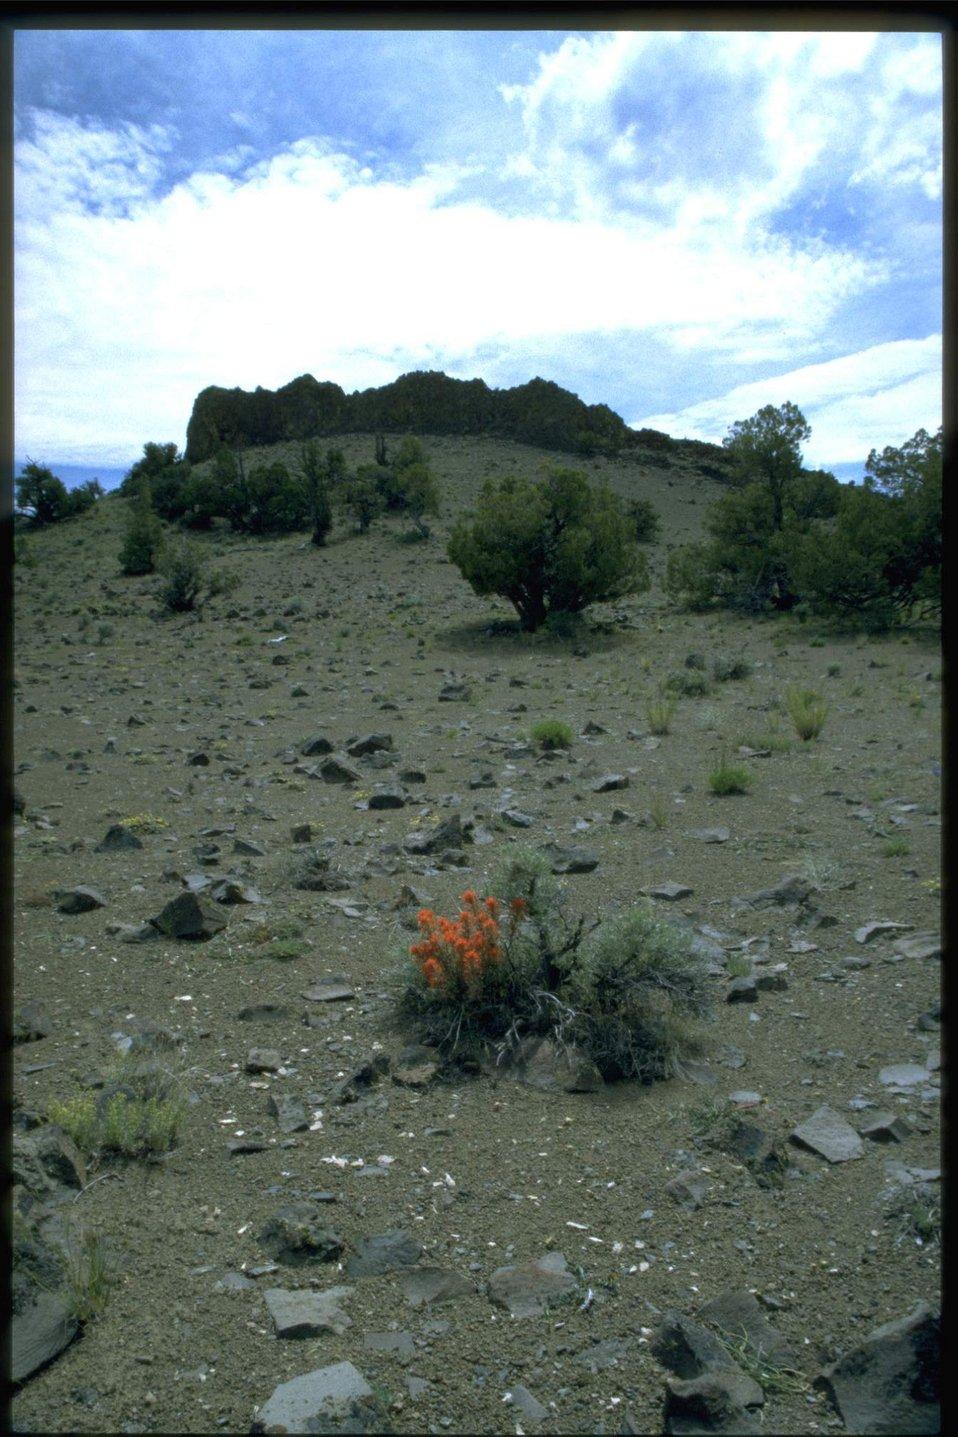 Farshot of Indian Paintbrush habitat.